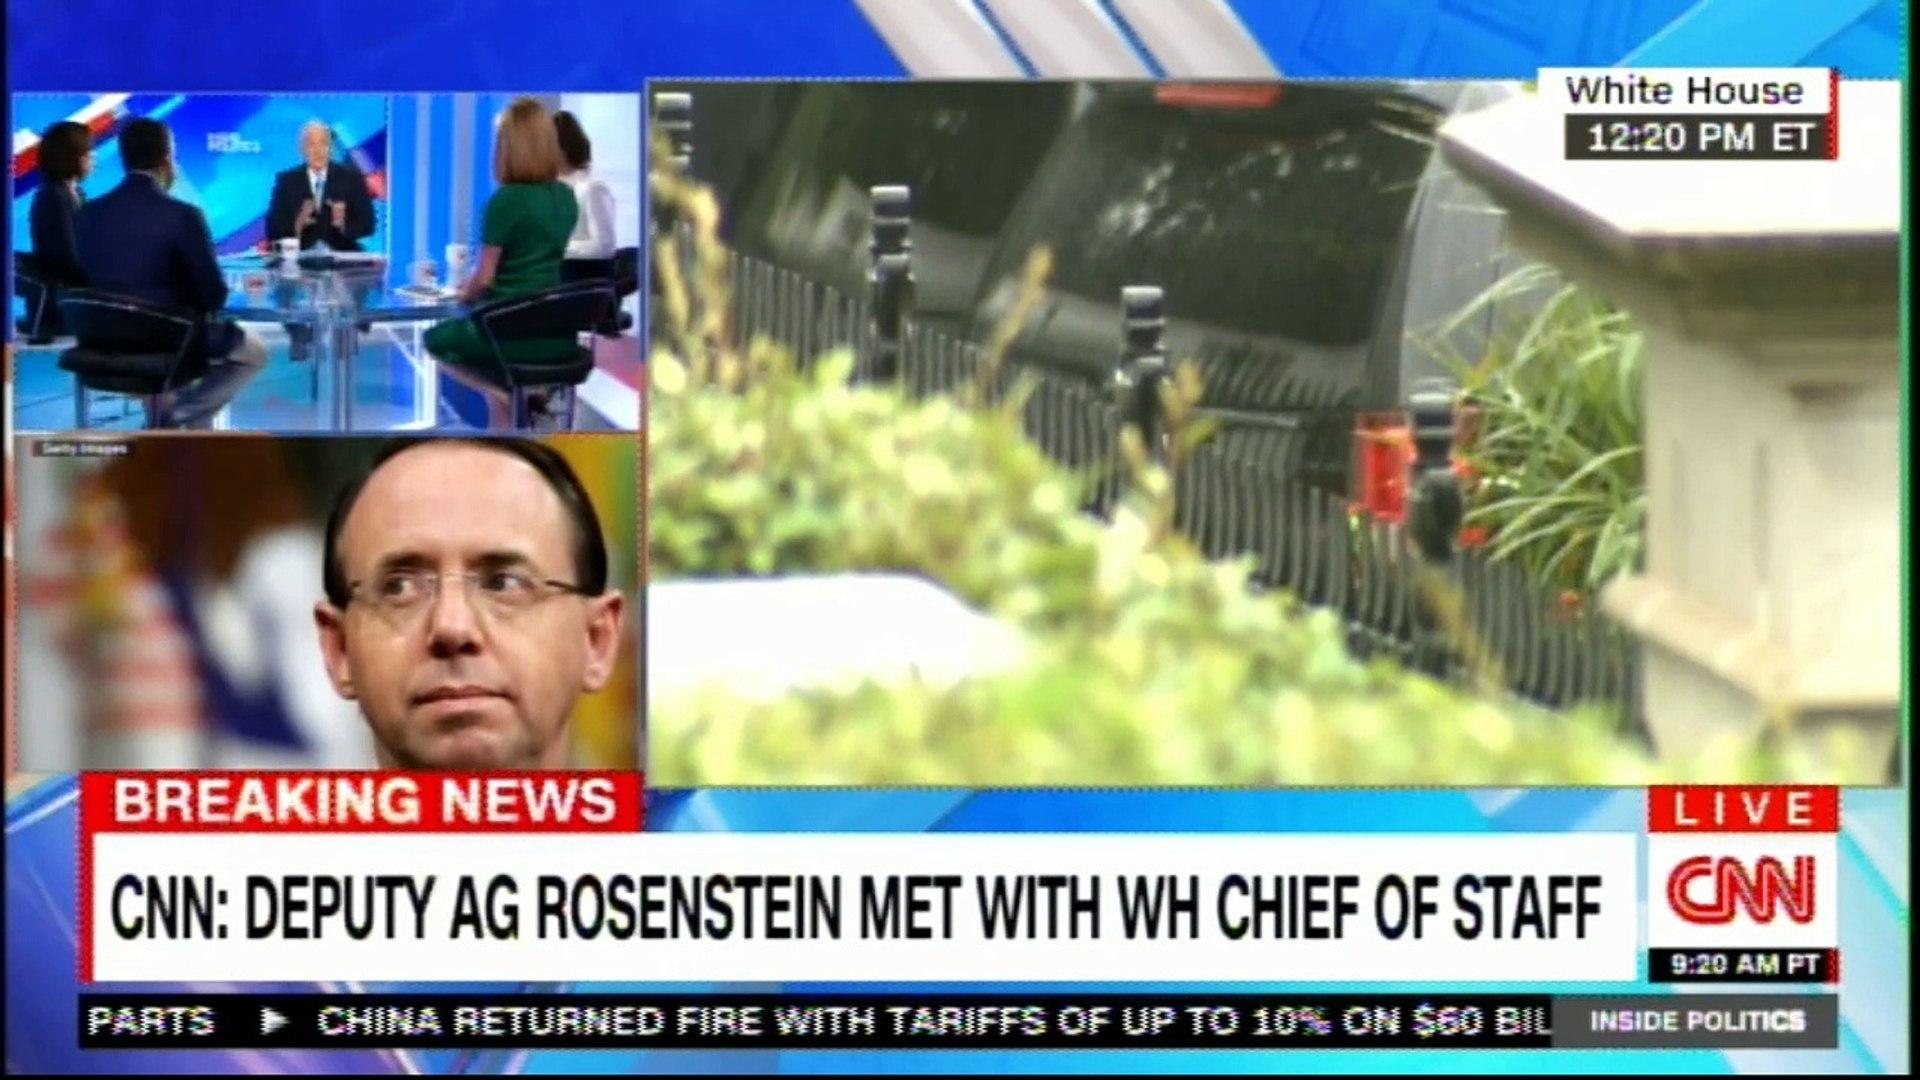 CNN: Deputy Attorney General Rosenstein to meet with White House Chief of Staff. #Breaking #News #Ro